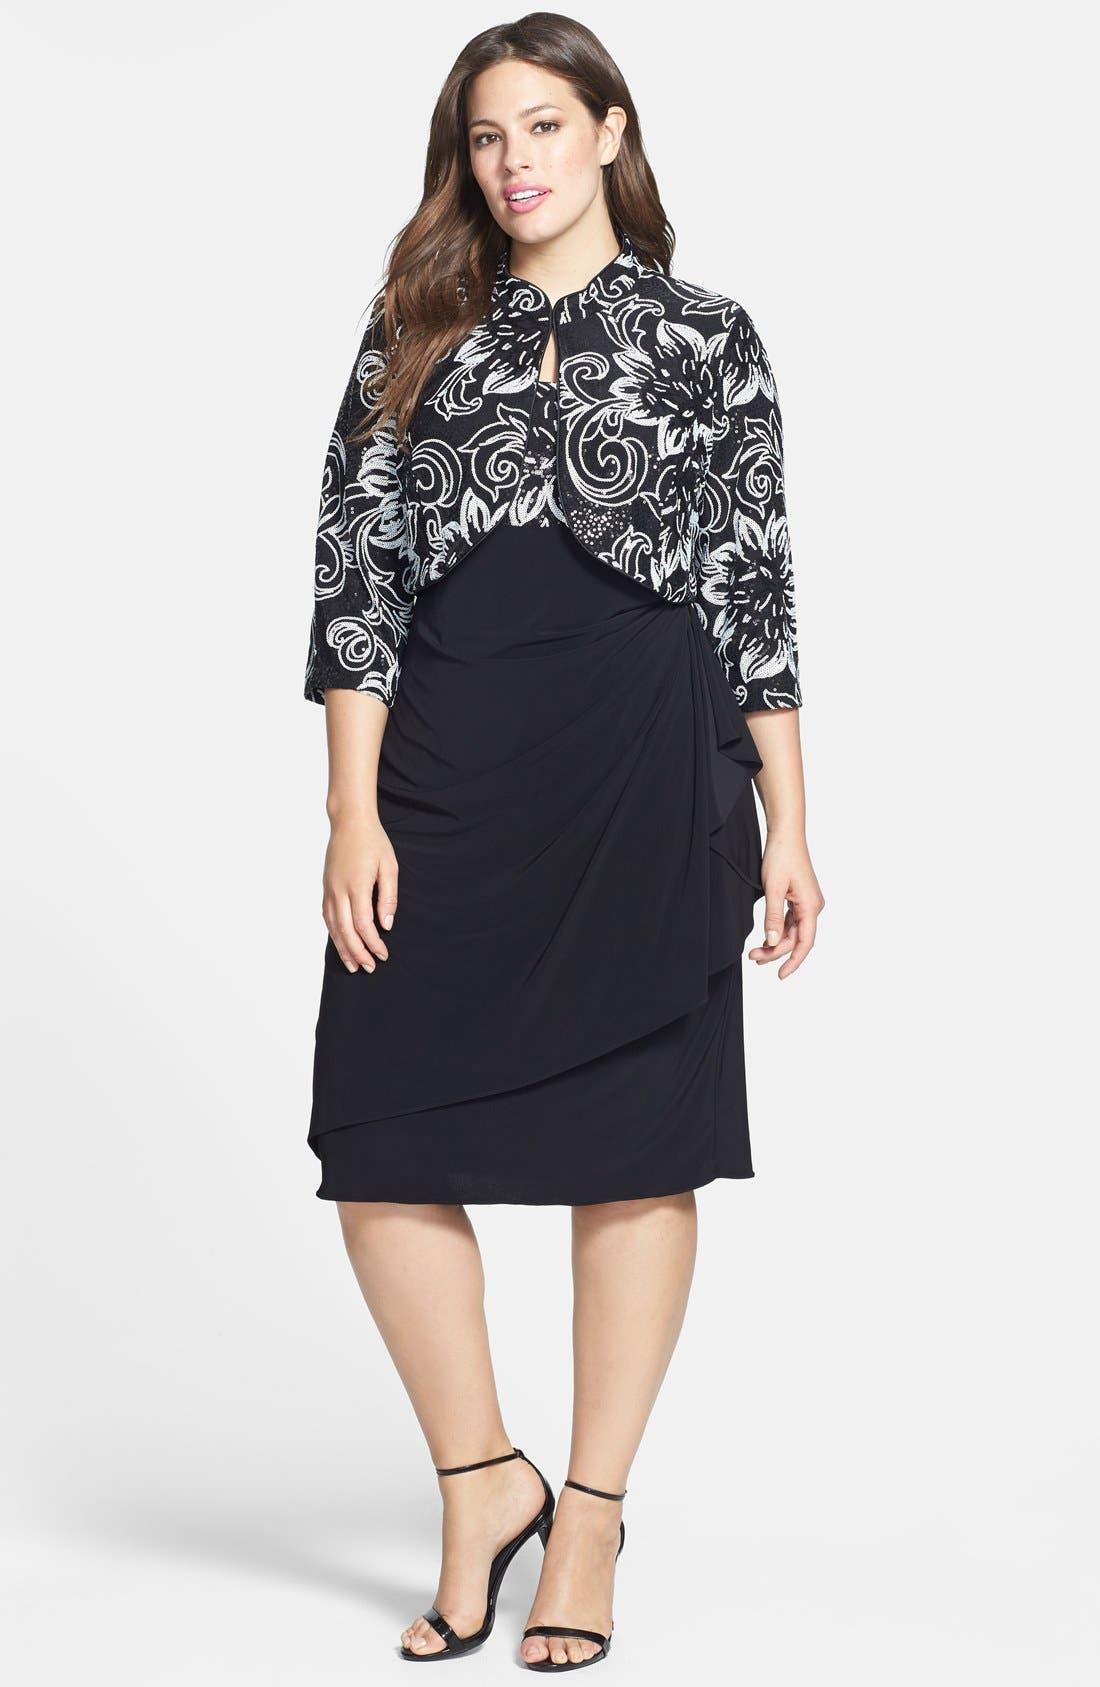 Alternate Image 1 Selected - Alex Evenings Sequin Patterned Dress & Jacket (Plus Size)